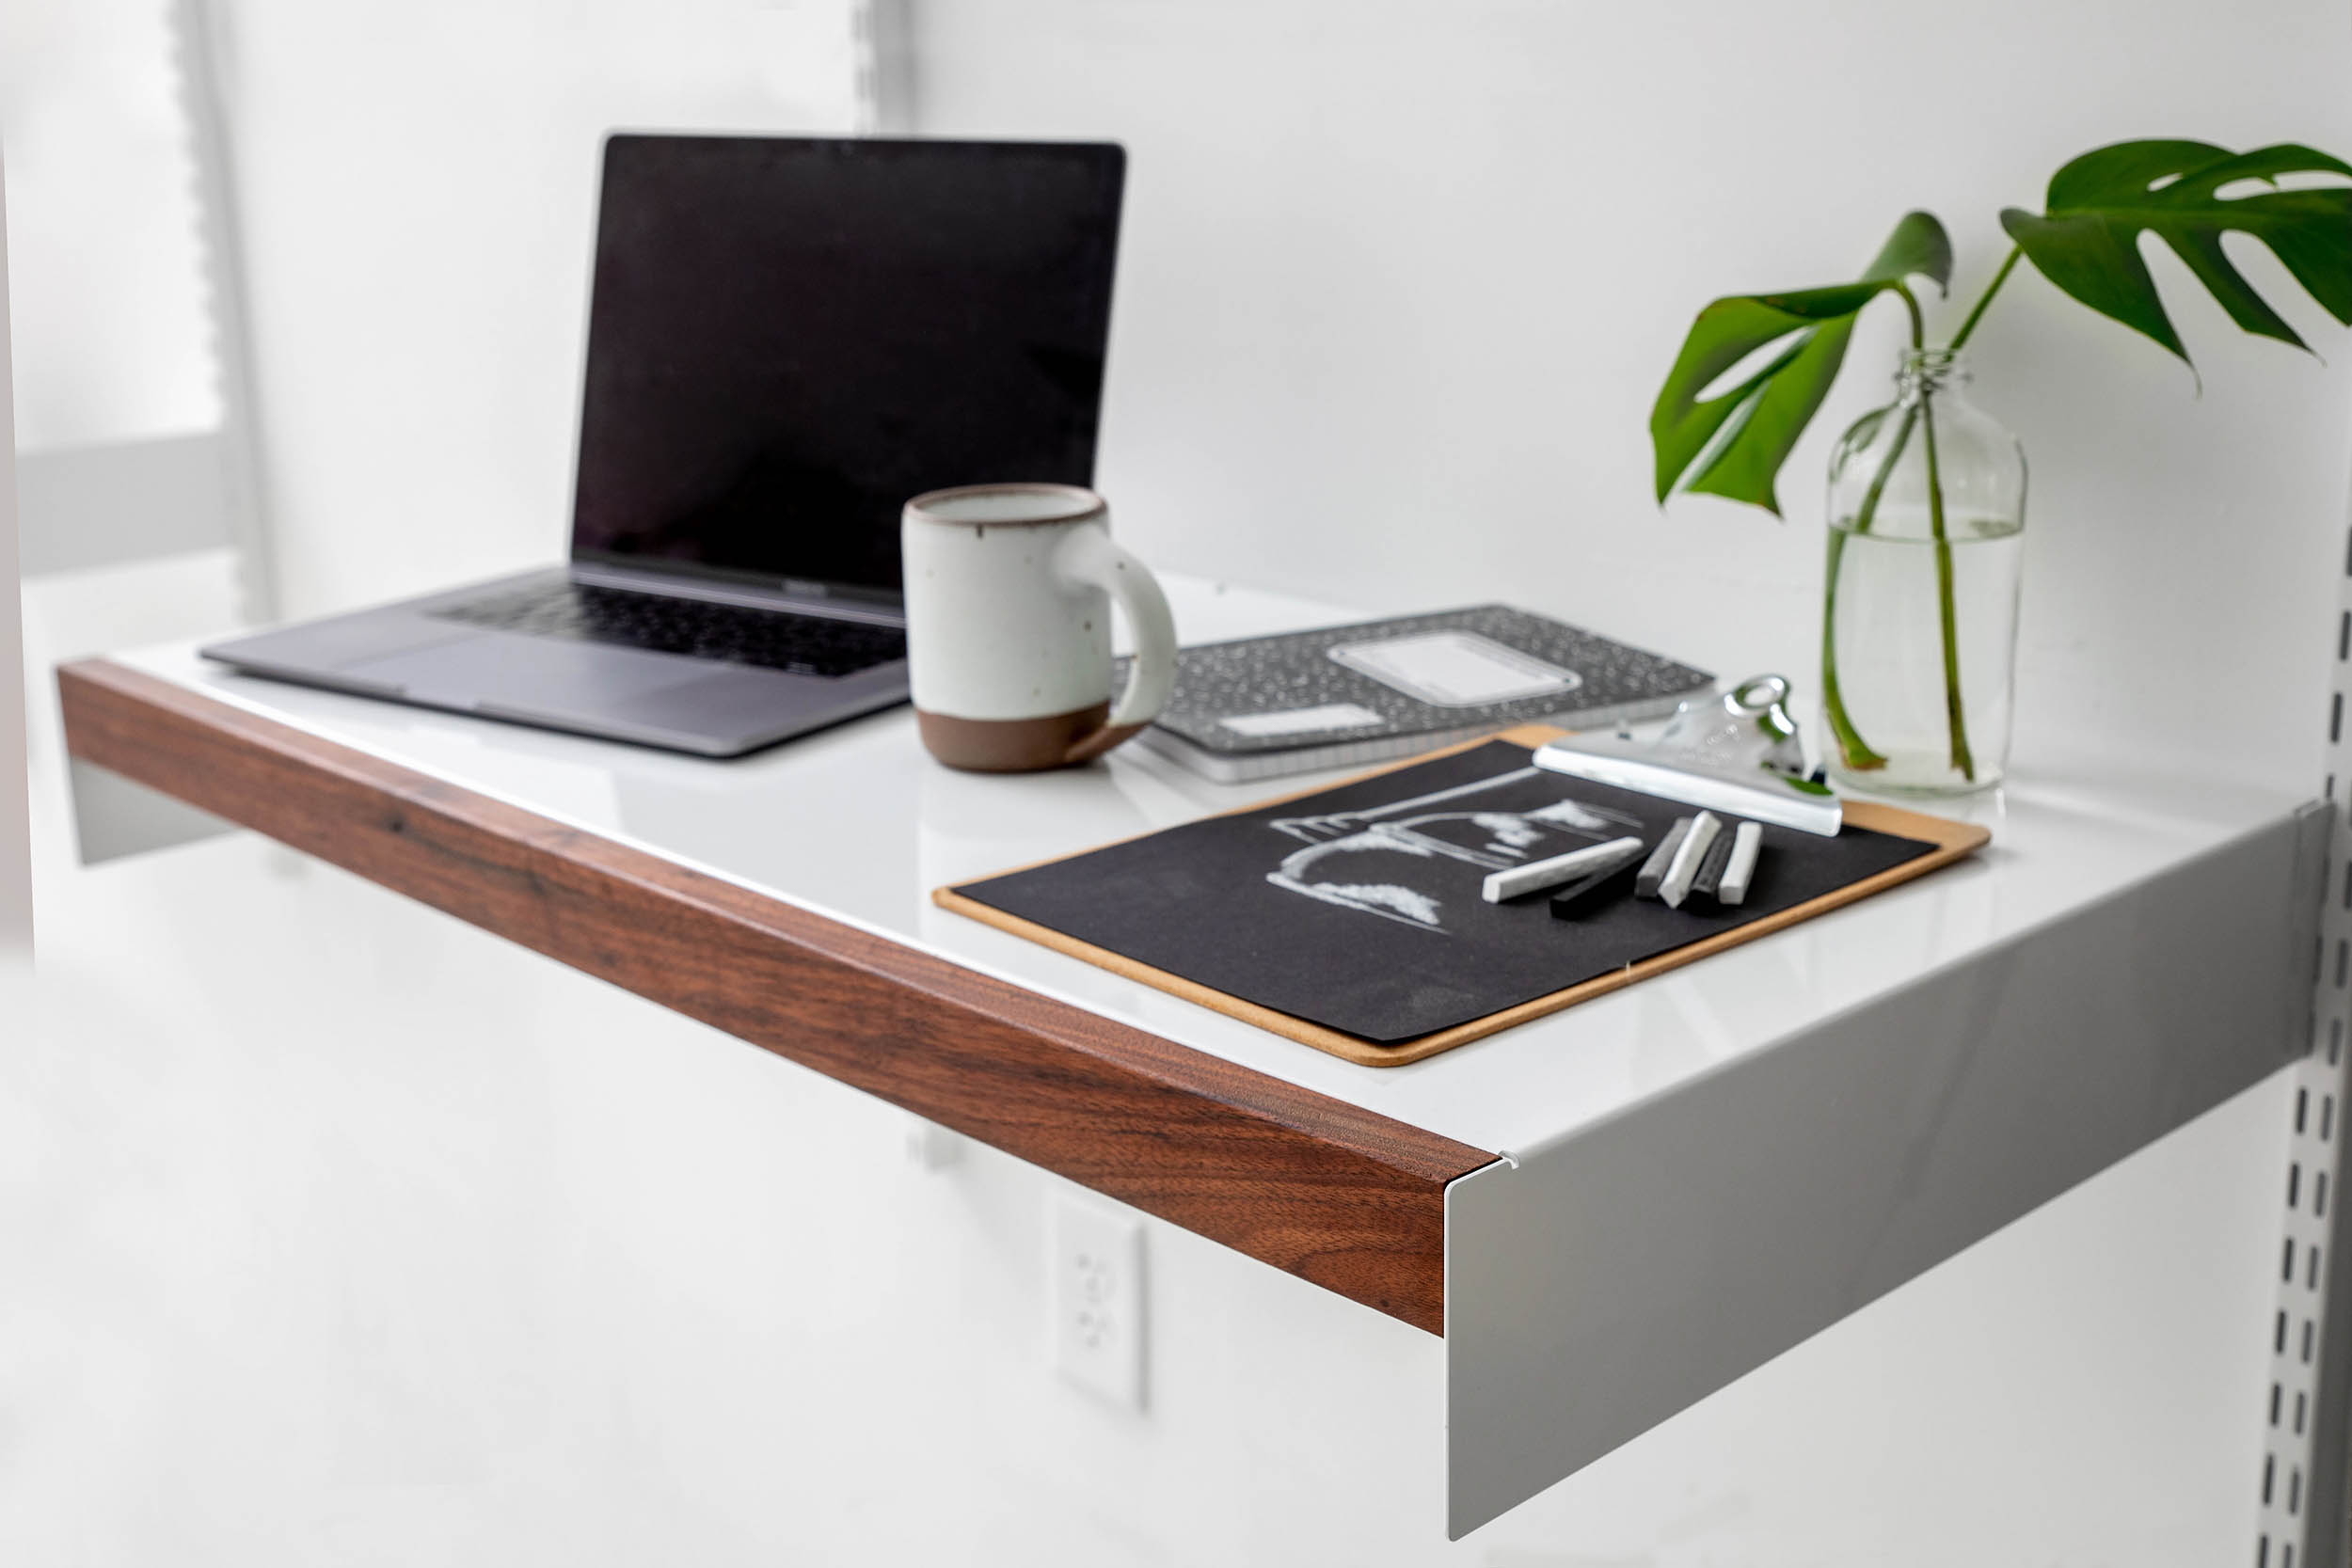 Adjustable Desk with walnut wood